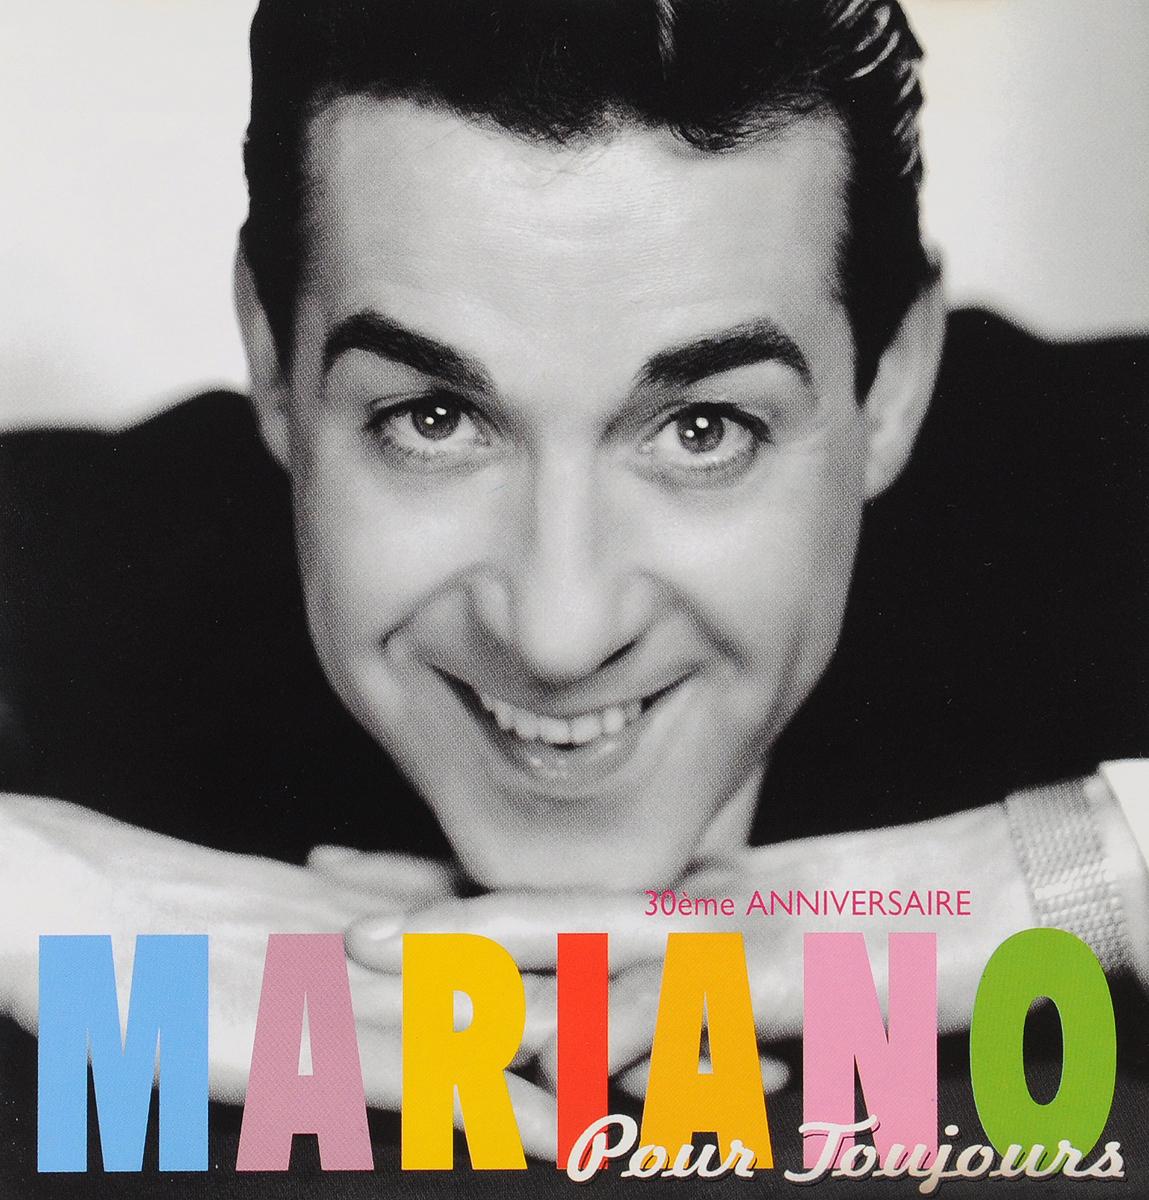 Luis Mariano. Les Tresors De Luis Mariano - 30th Anniversary luis chataing bogota